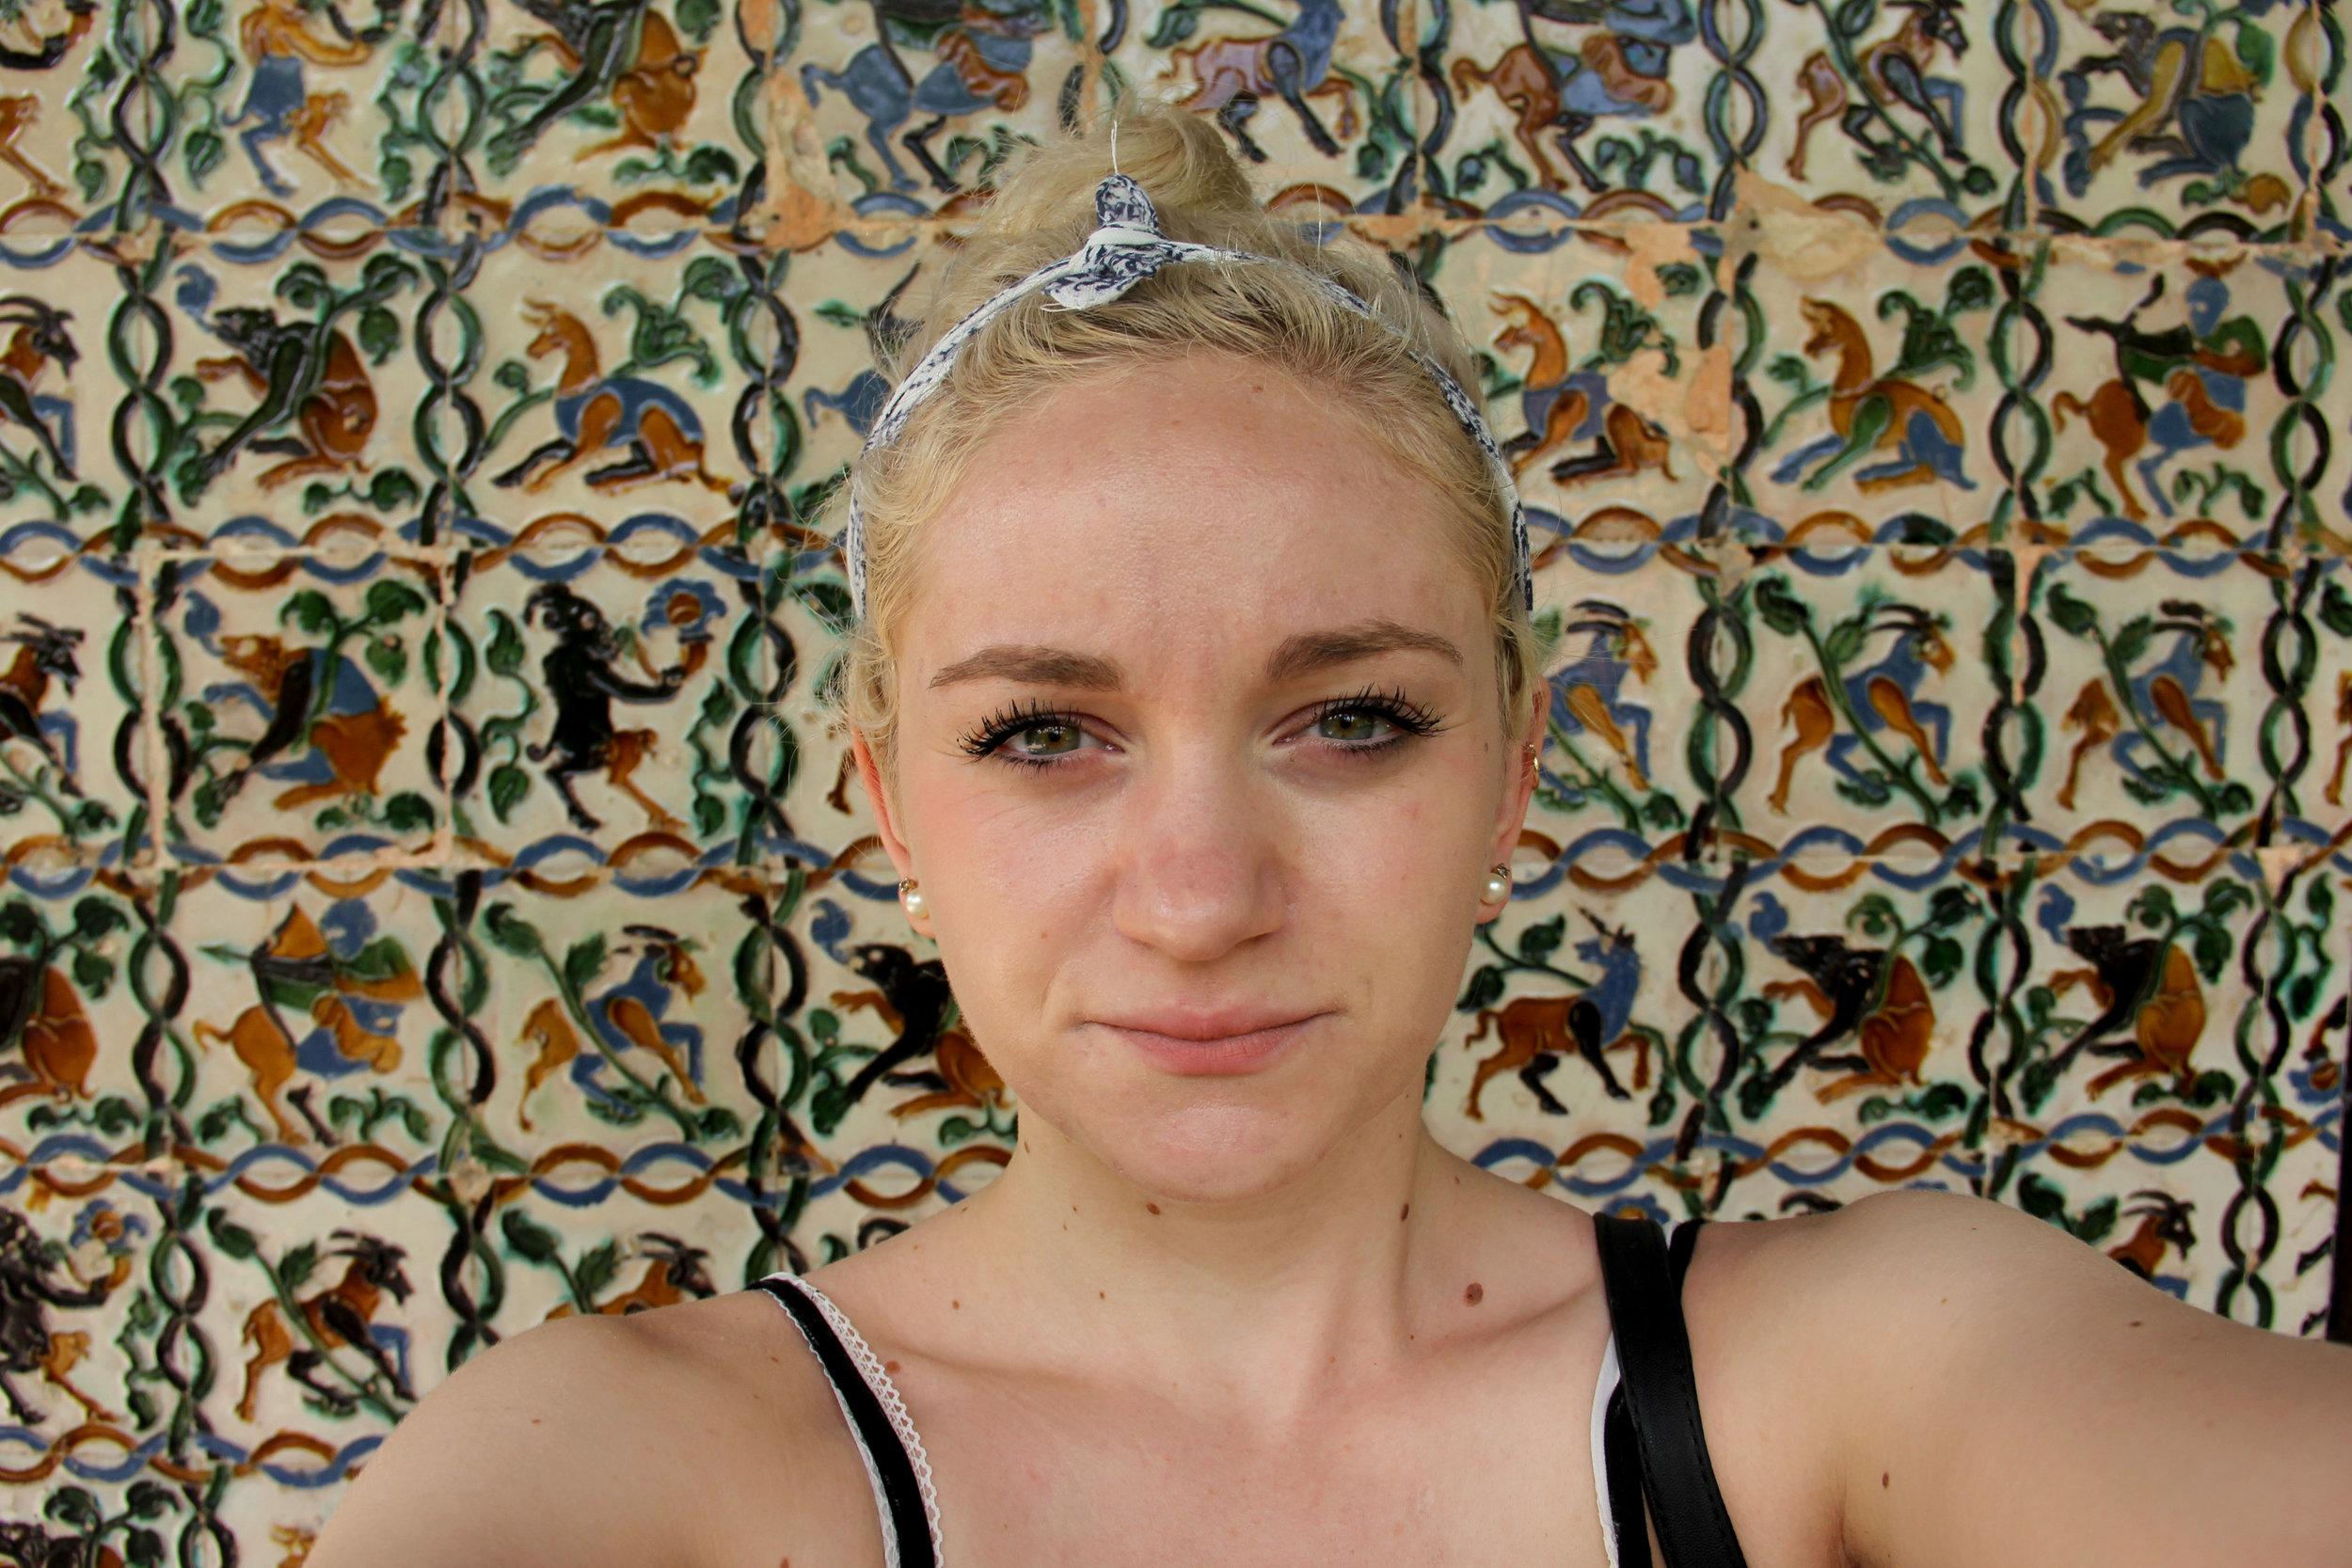 A Selfie - Heat Exhaustion